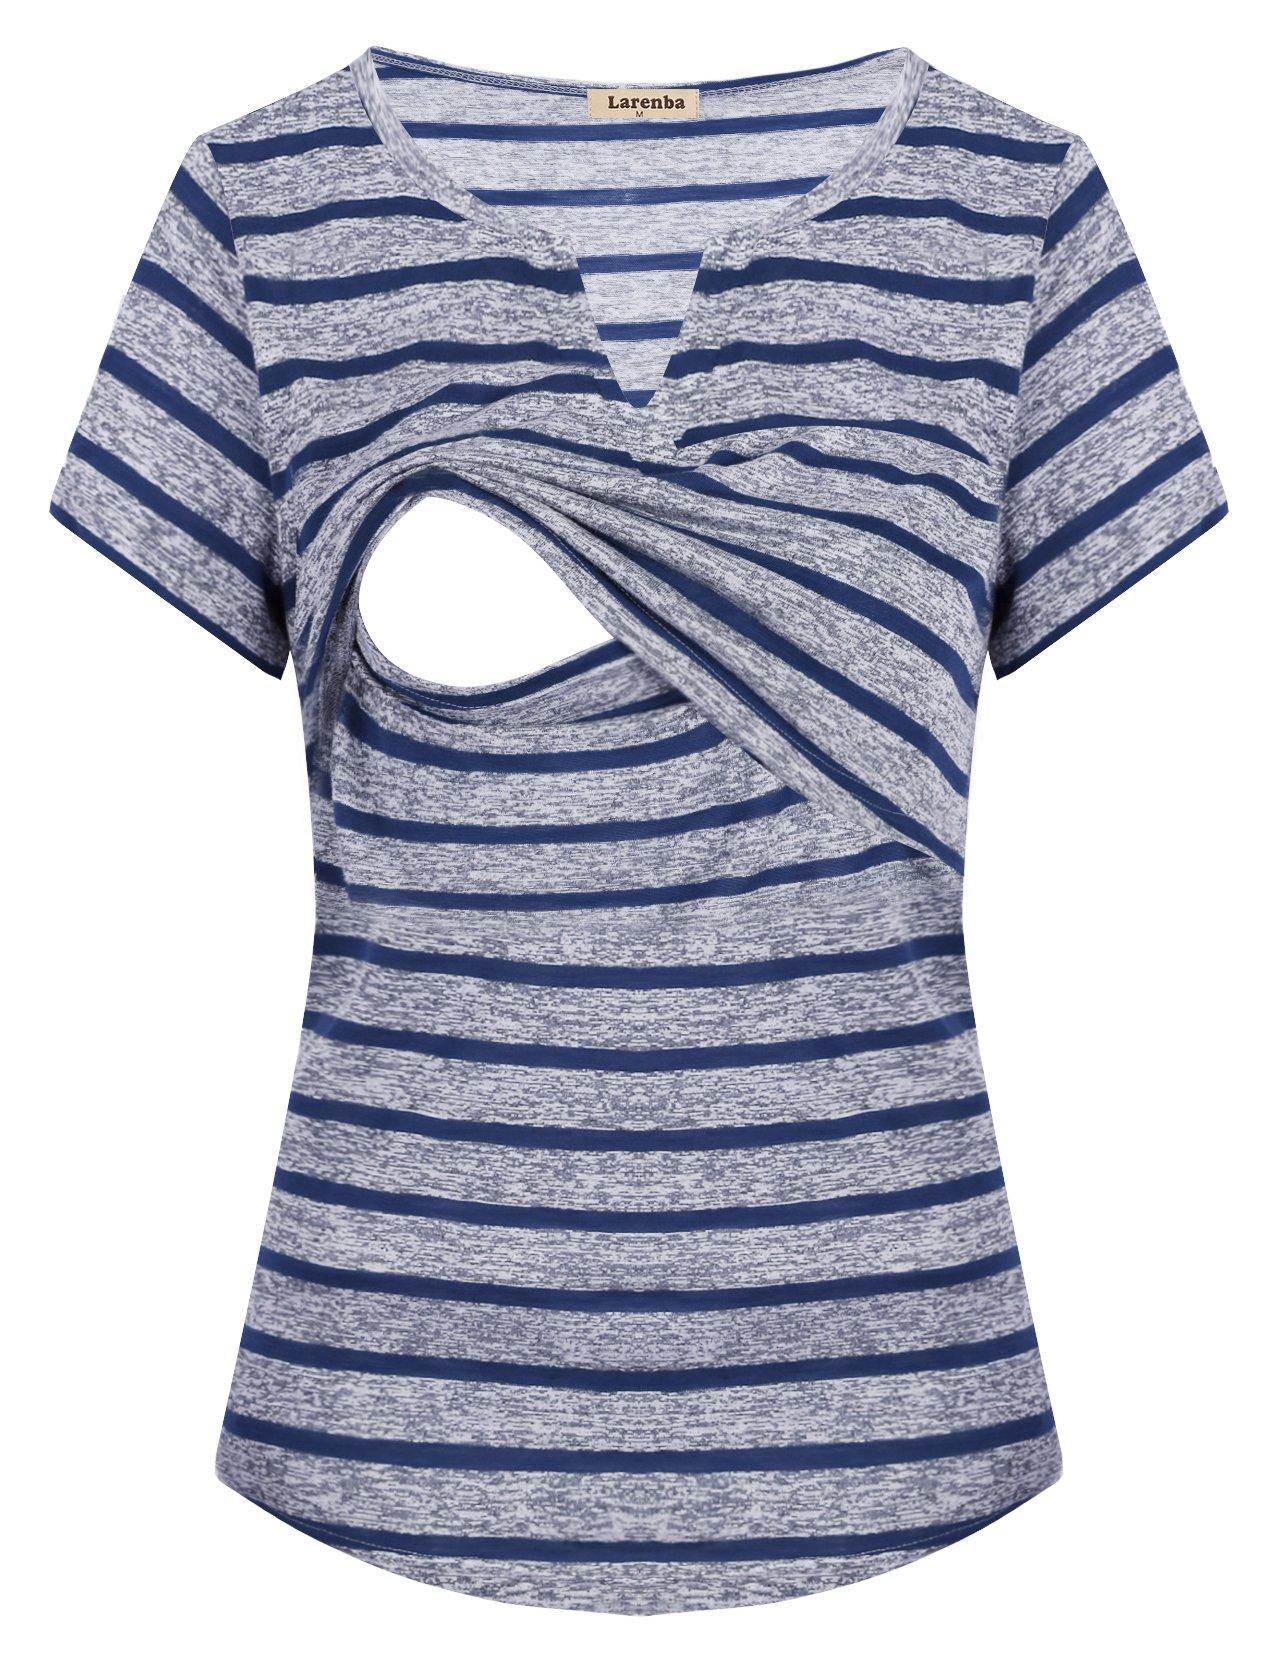 Larenba Nursing Pajama Top, Maternity Women Soft Flattering Cute Breastfeeding Blouse Stripe Nursing Sleep Shirt Functional Discrete Access Latched Mama(Blue,Medium)